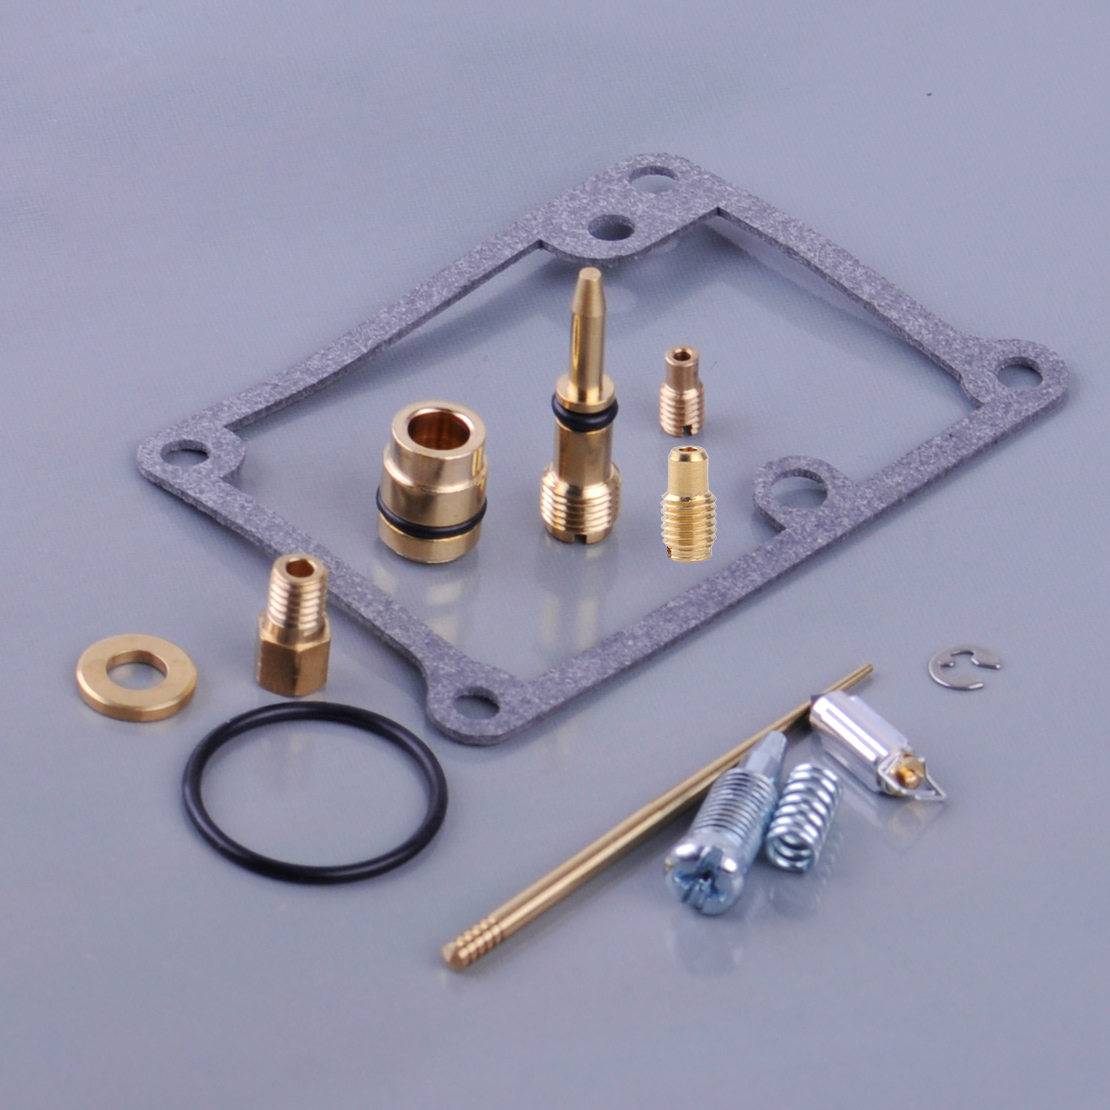 fuel system rebuild kits for yamaha banshee yfz350 carburetor carb rebuild kit repair yfz 350 2  [ 1110 x 1110 Pixel ]